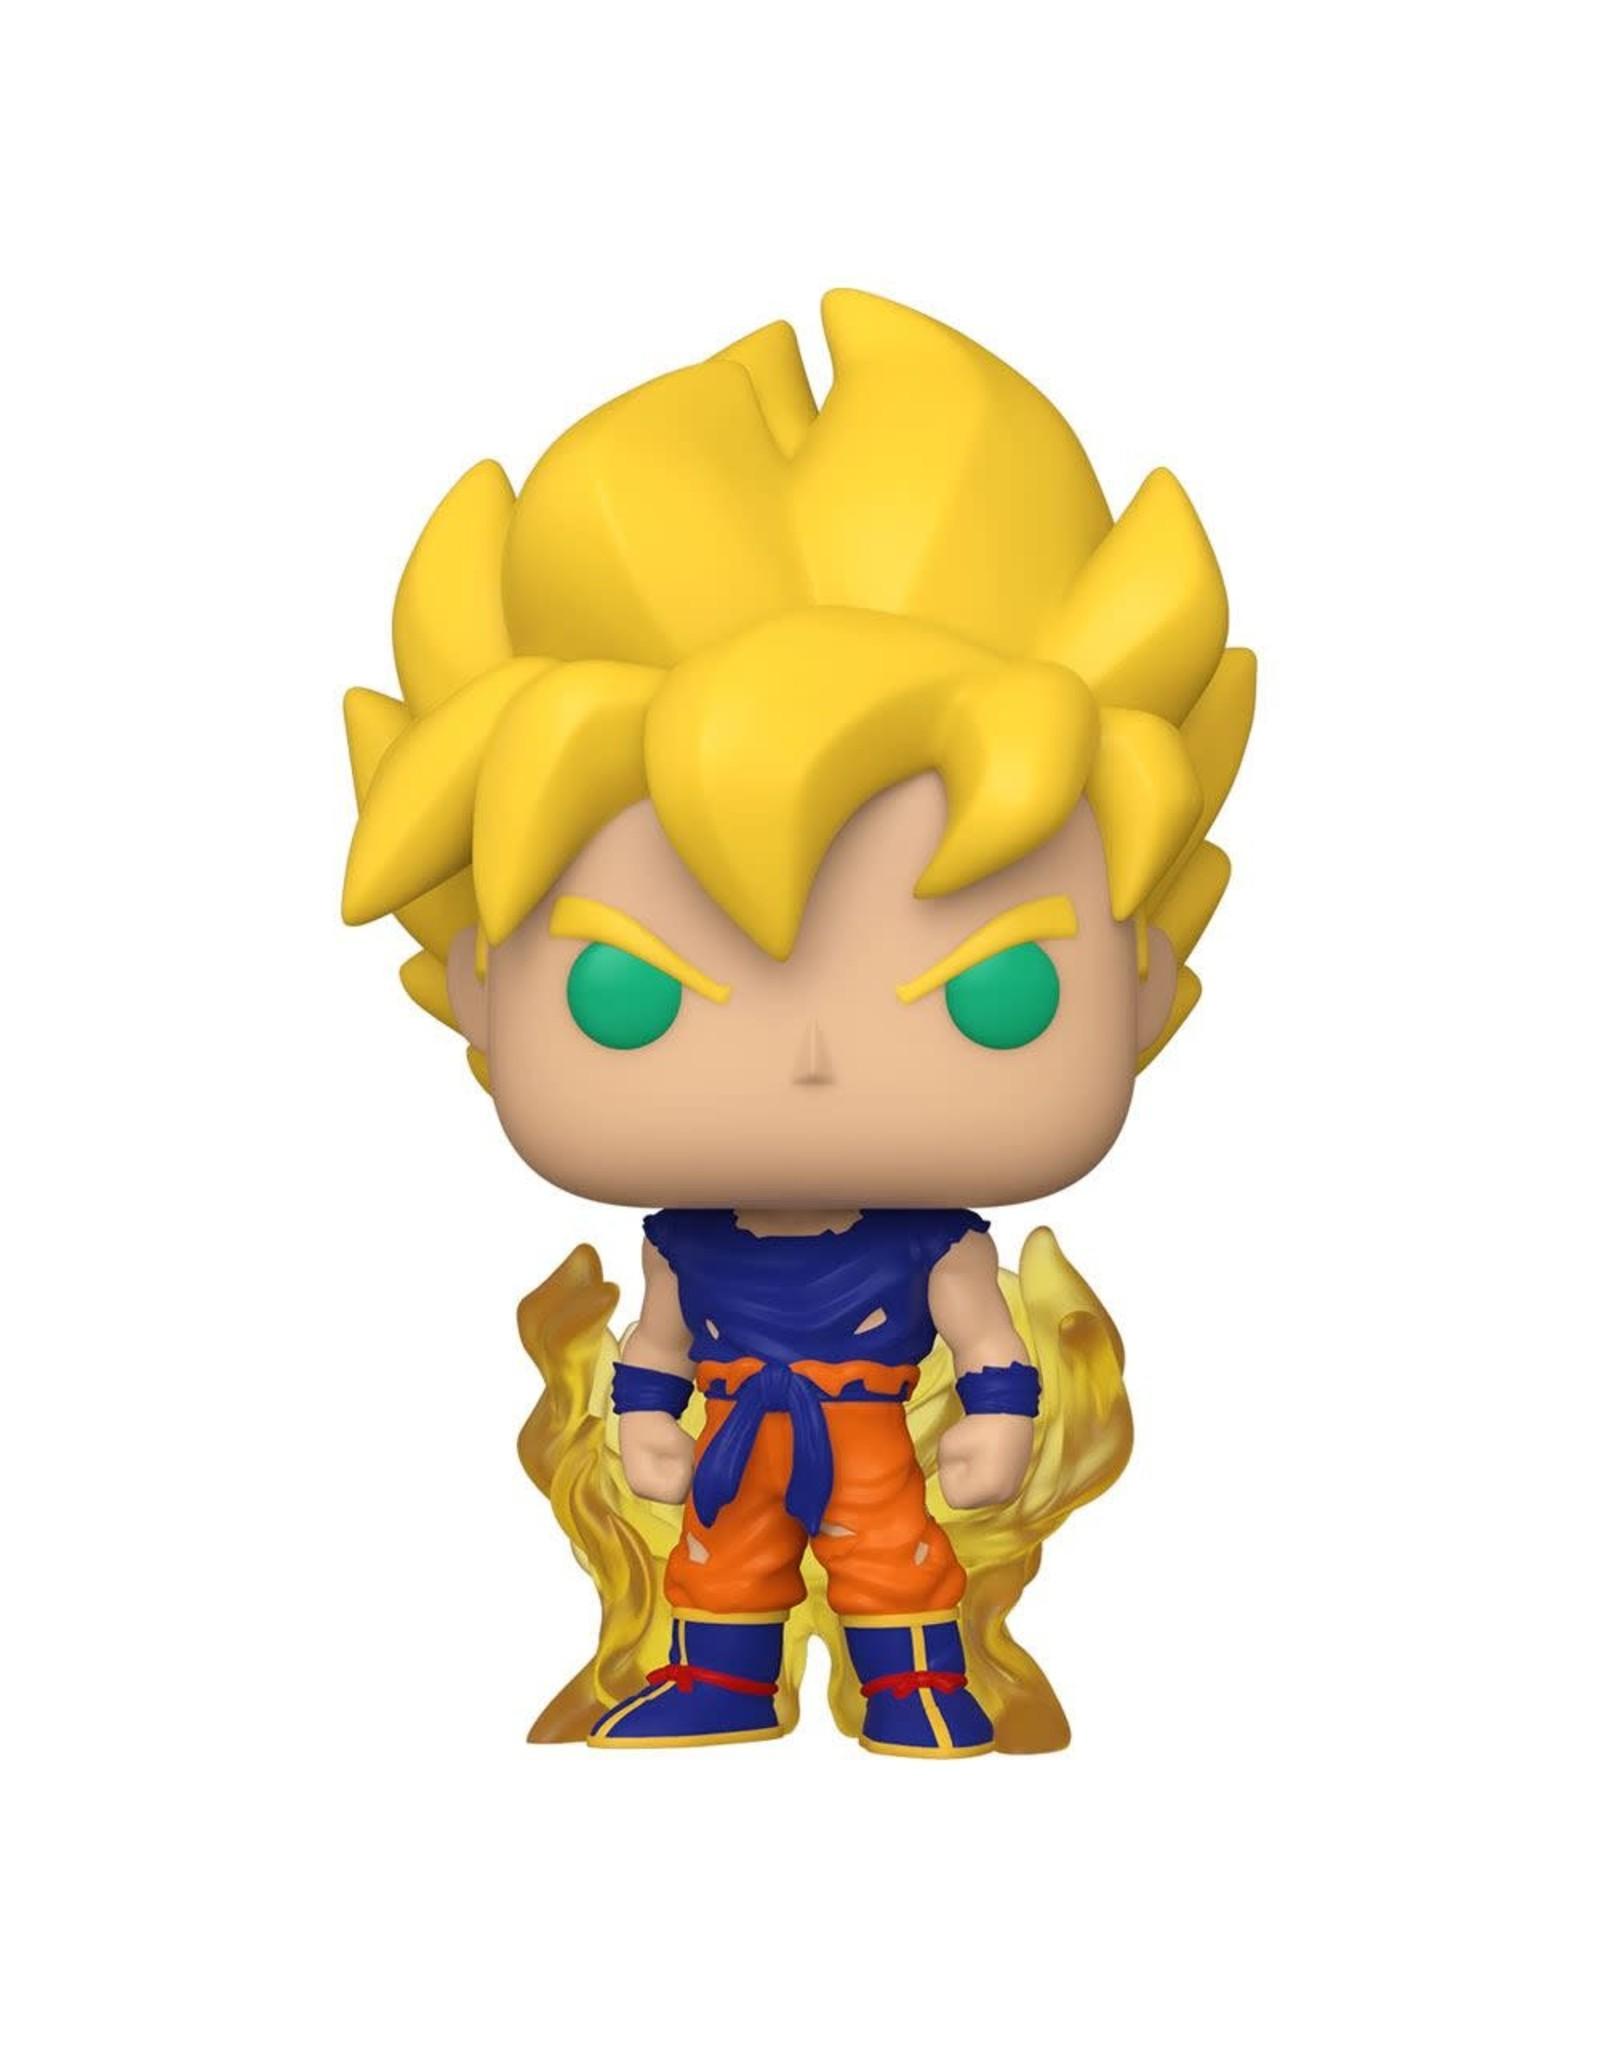 Funko DRAGON BALL Z POP! 9 cm - SS Goku First Appearance